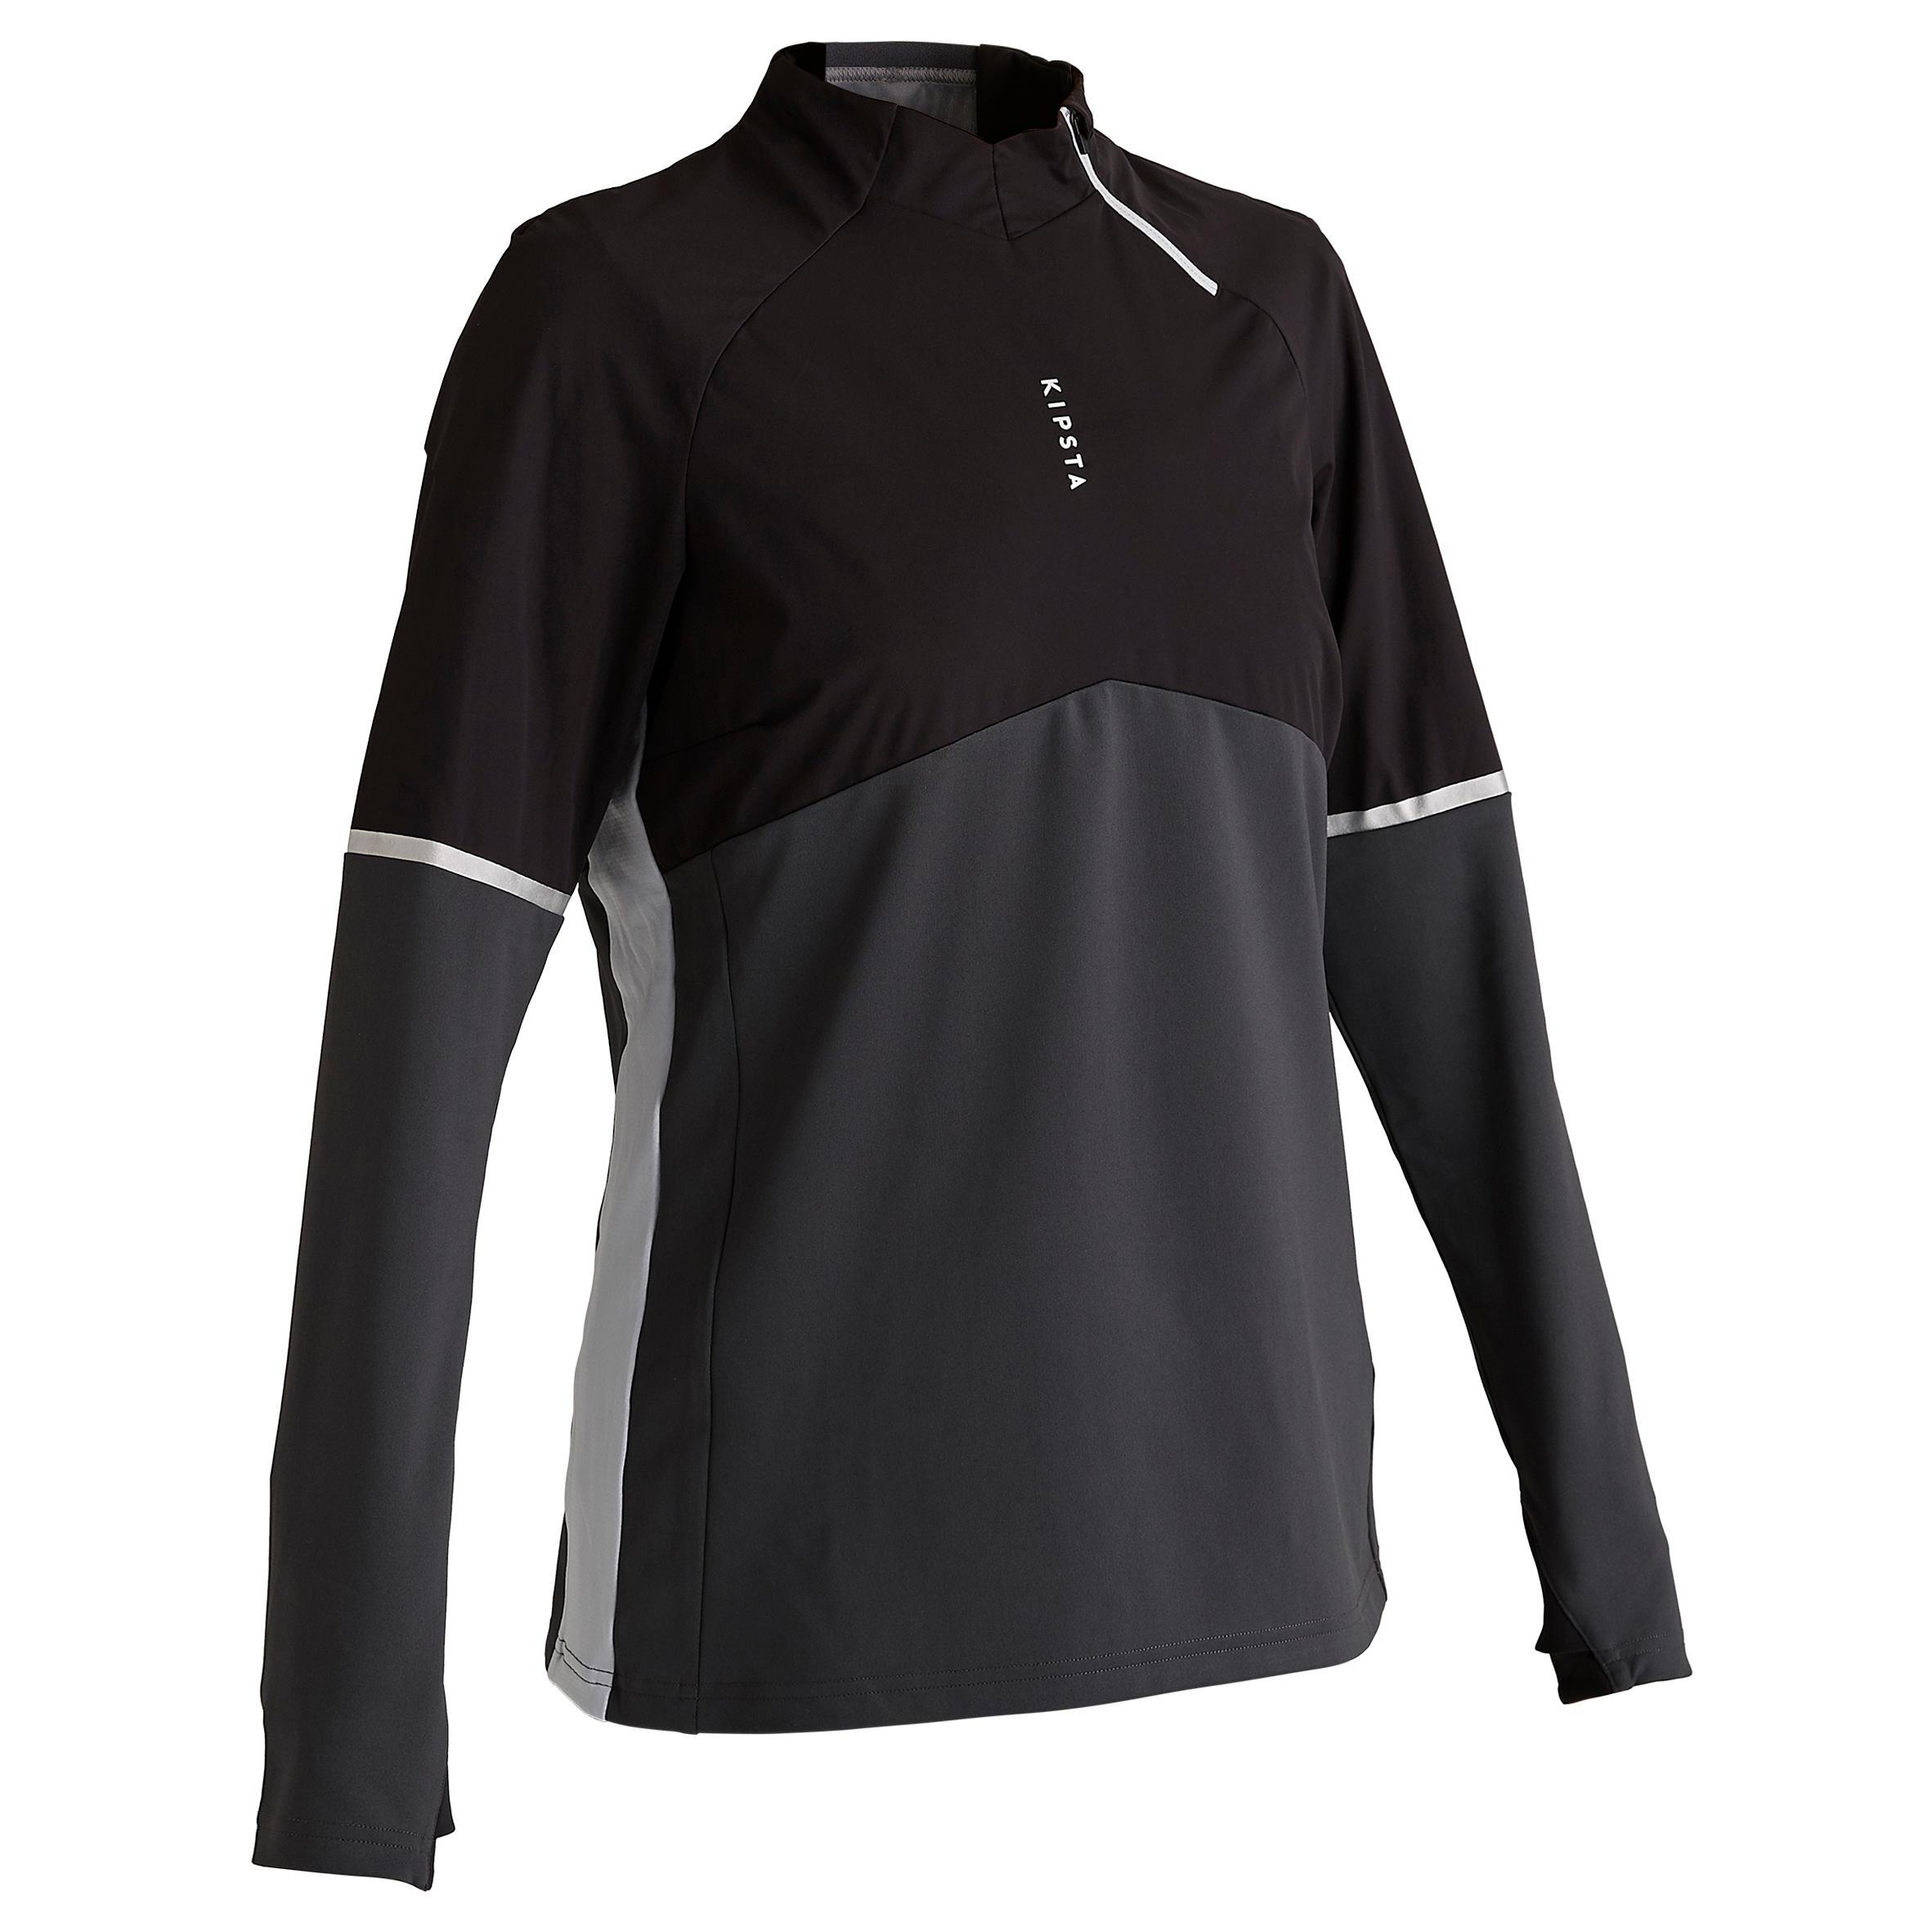 eedb332aec7 Voetbalkleding dames kopen | DECATHLON | Nergens goedkoper!